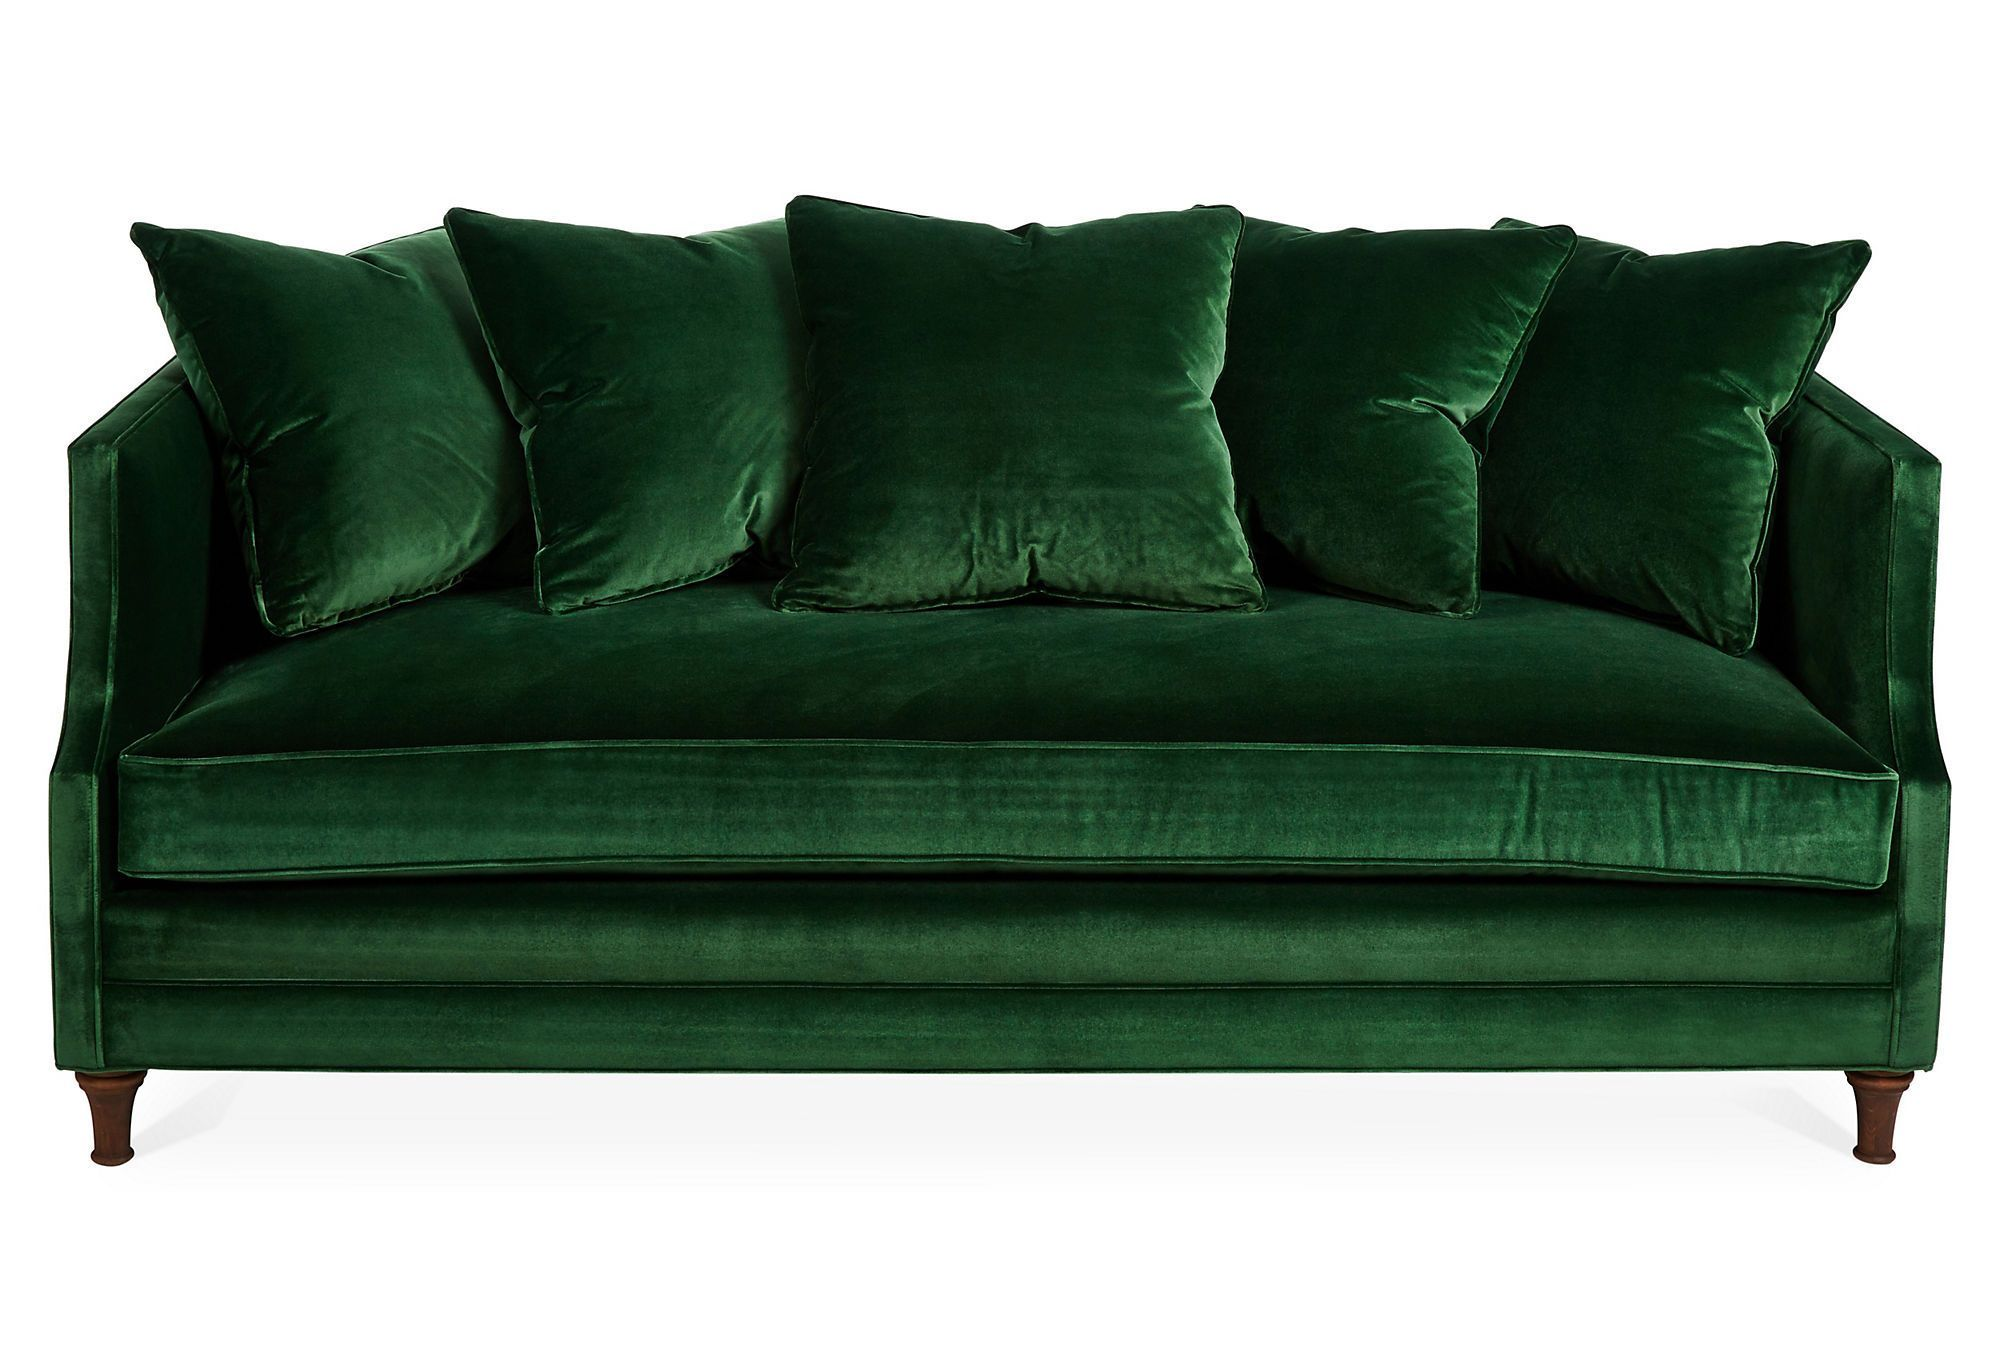 emerald green velvet chair folding materials dumont 85 quot sofa one kings lane КОЛЛАЖИ